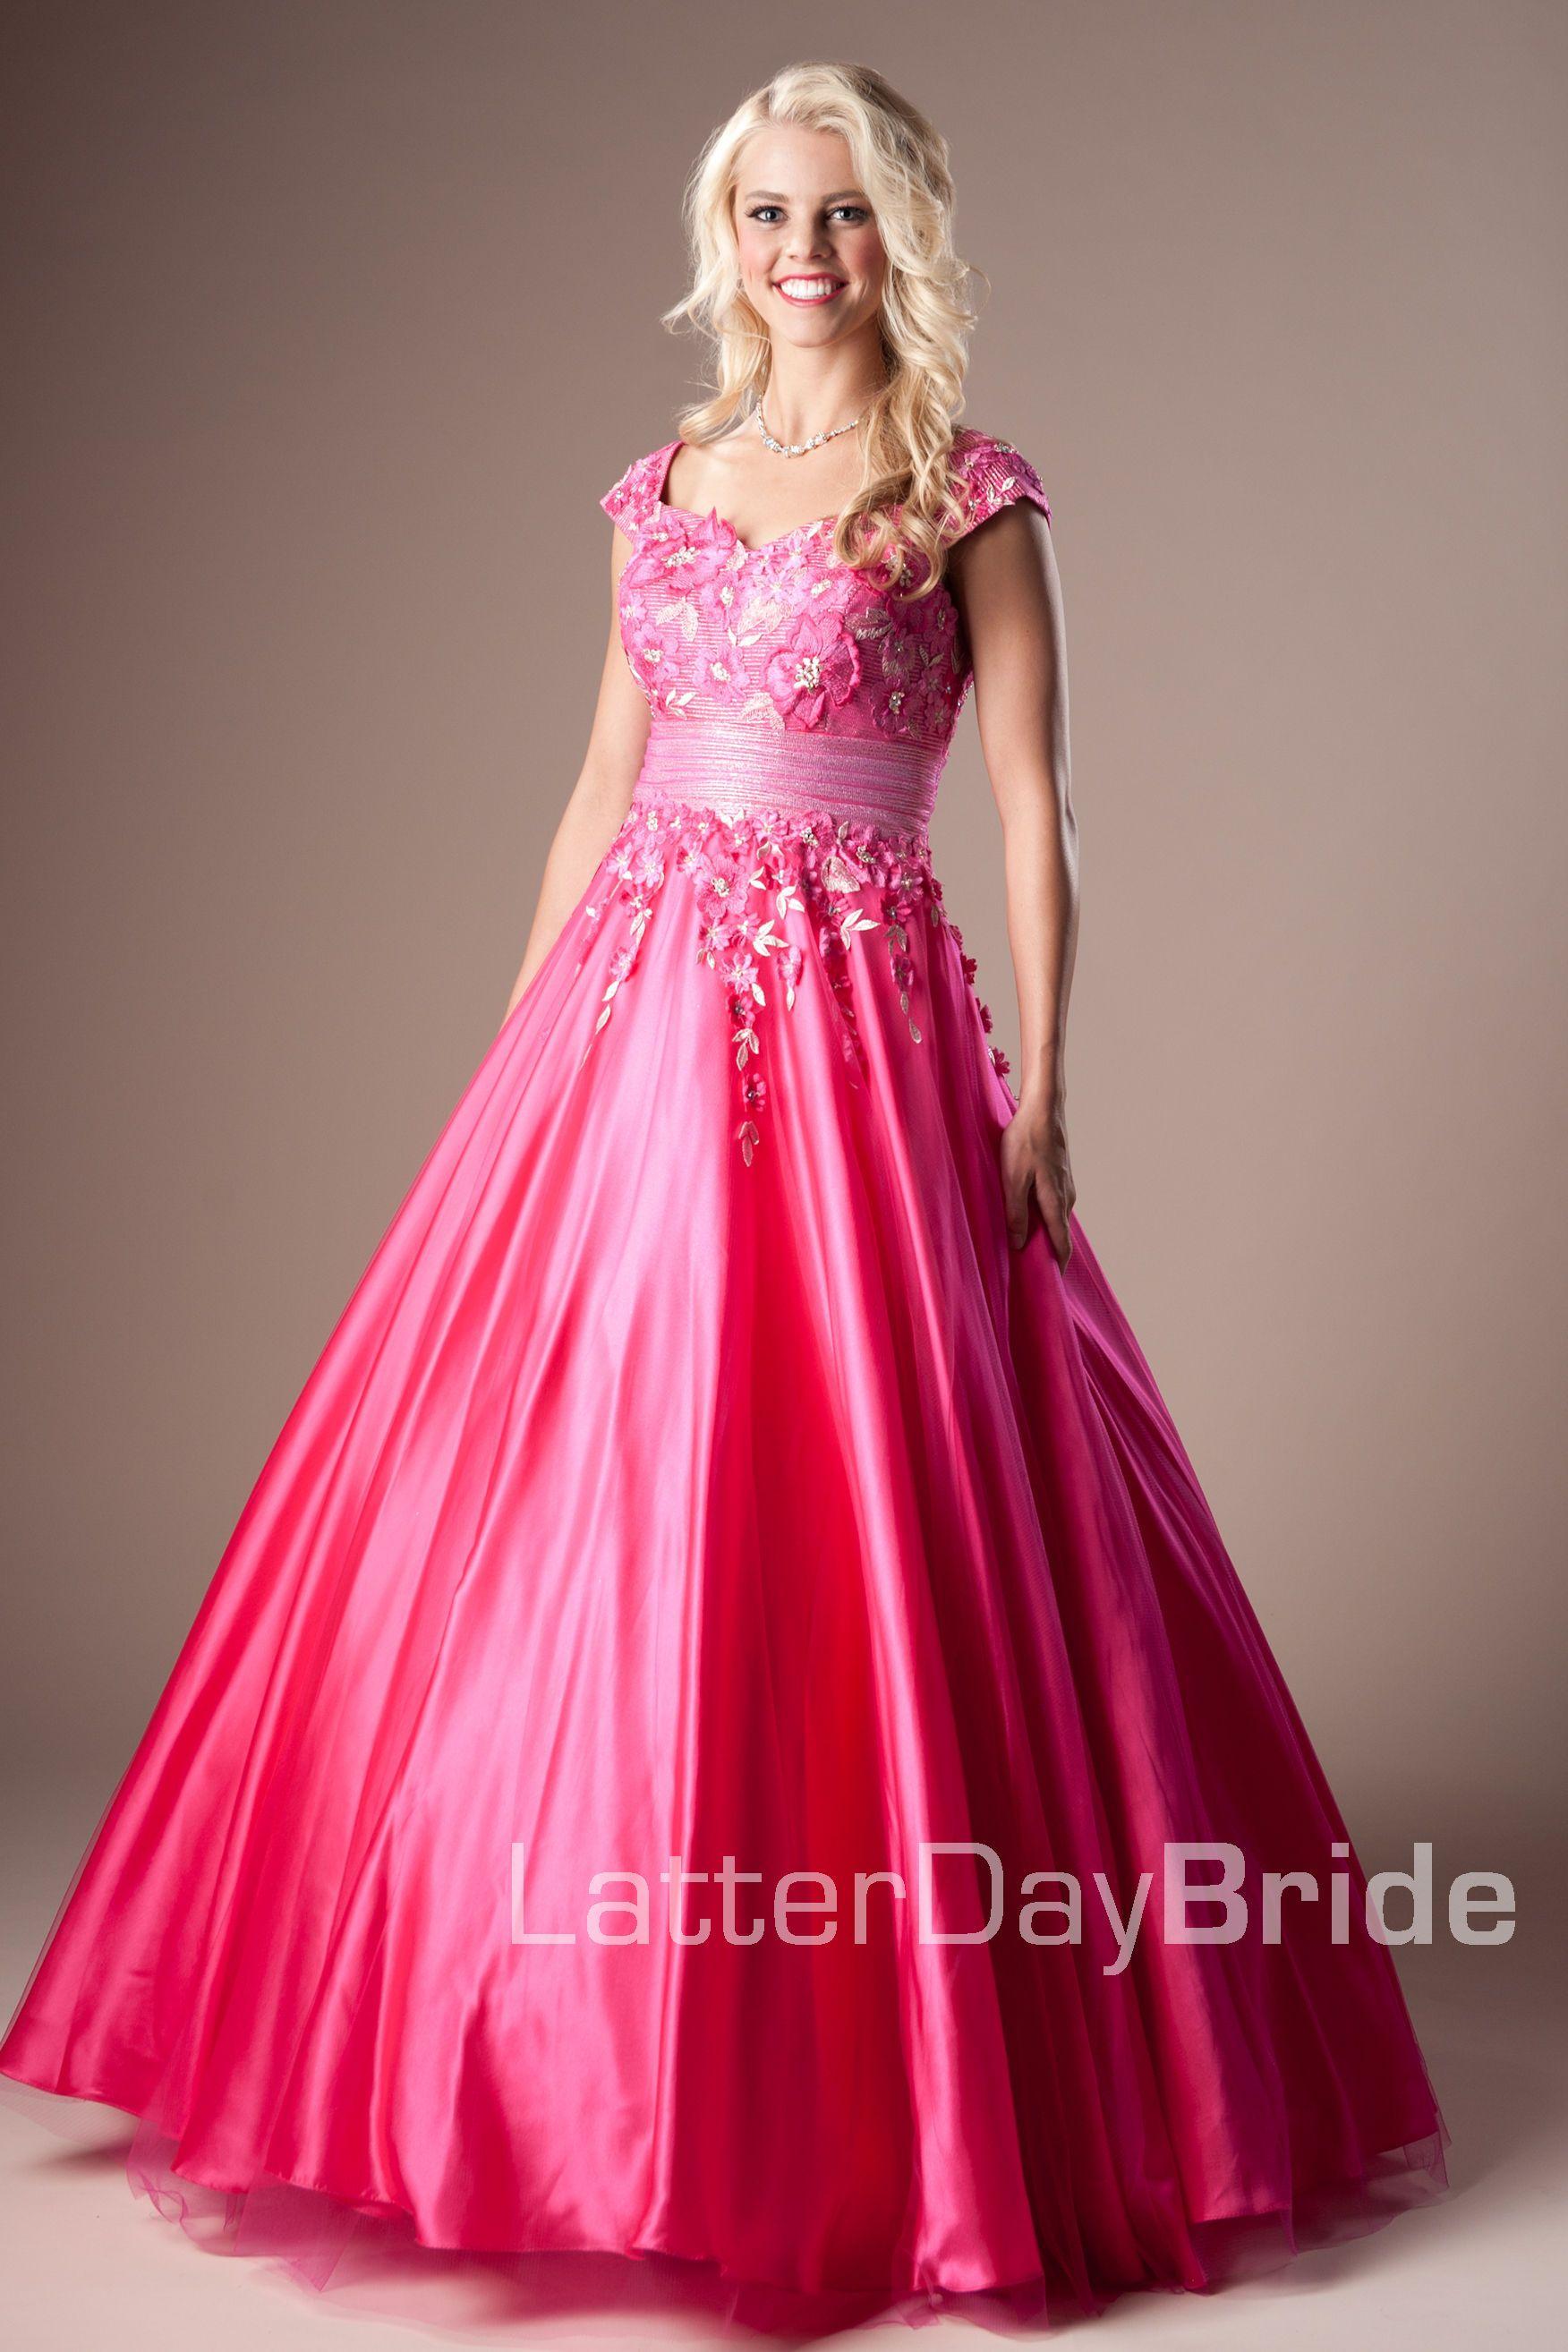 Bridesmaid Prom Shayna Latterdaybride Prom Modest Mormon Lds Prom Dress Prom Dresses Modest Prom Dresses Modest Dresses [ 2628 x 1752 Pixel ]